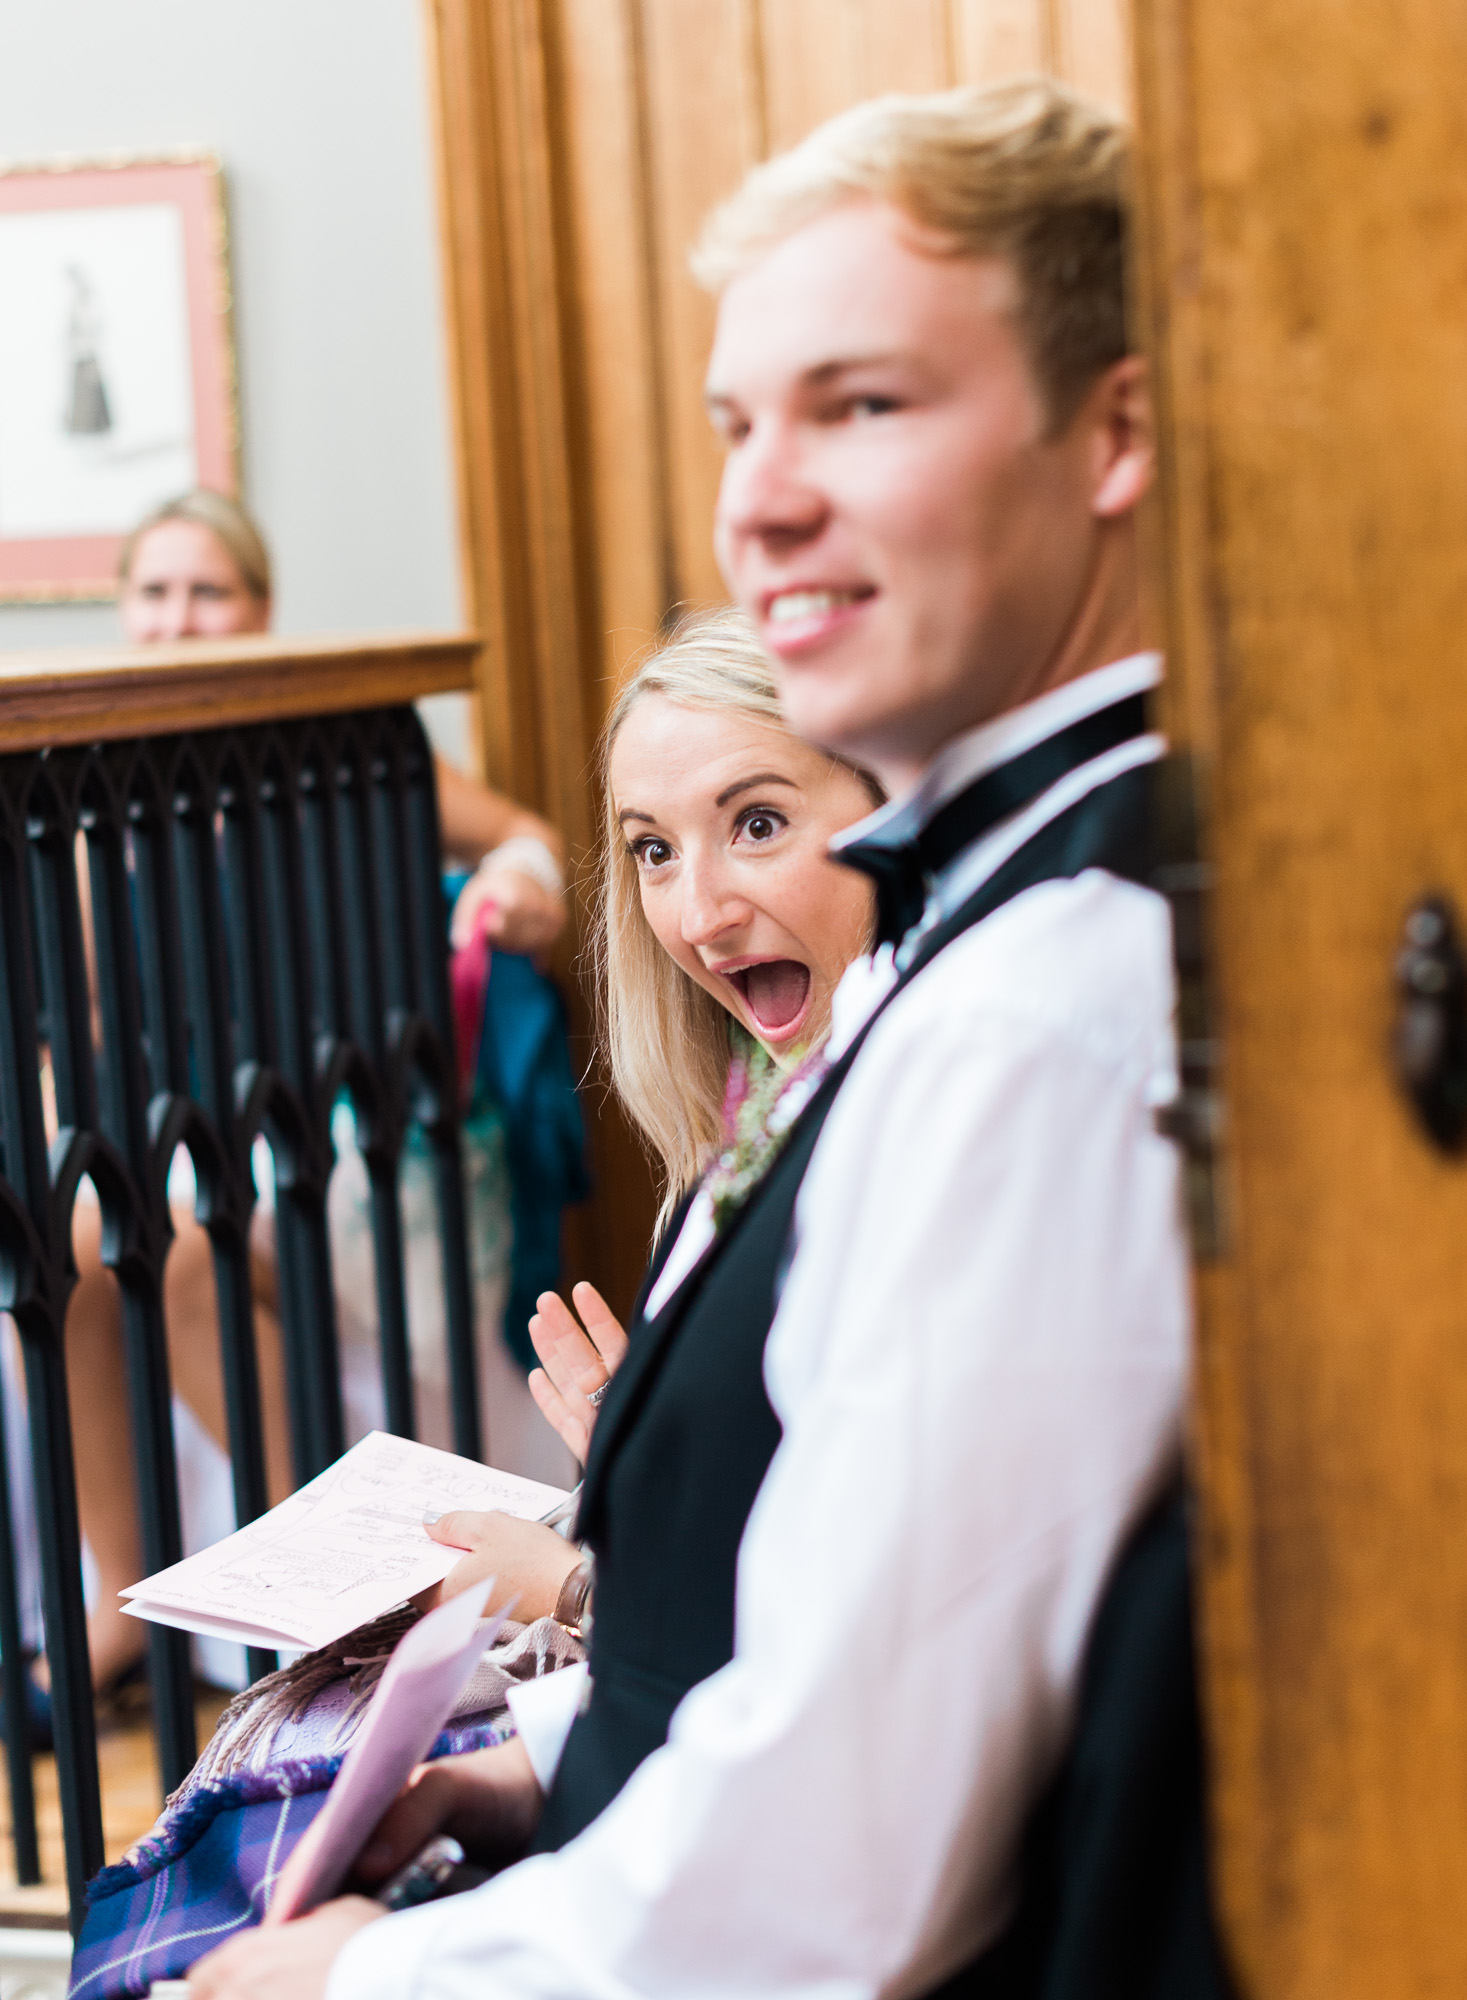 scottish_wedding_blairquhan_castle-62.jpg